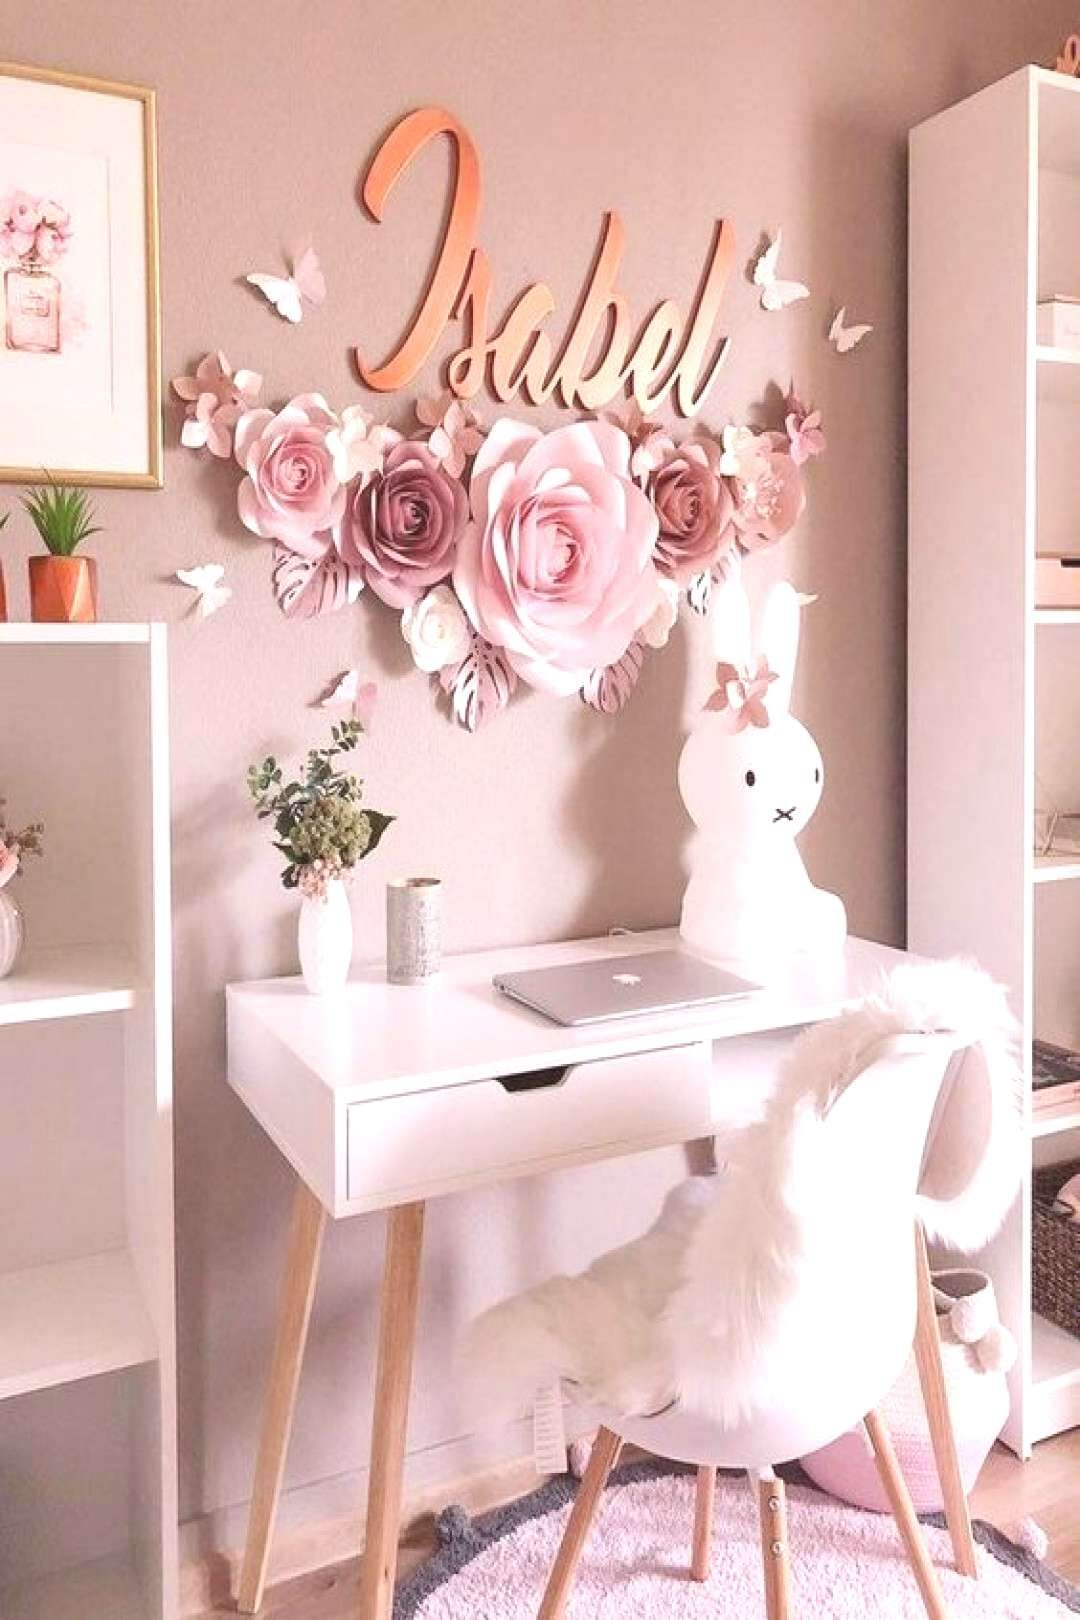 Bedroom ideas 8 year old pink bedroom for girls nursery